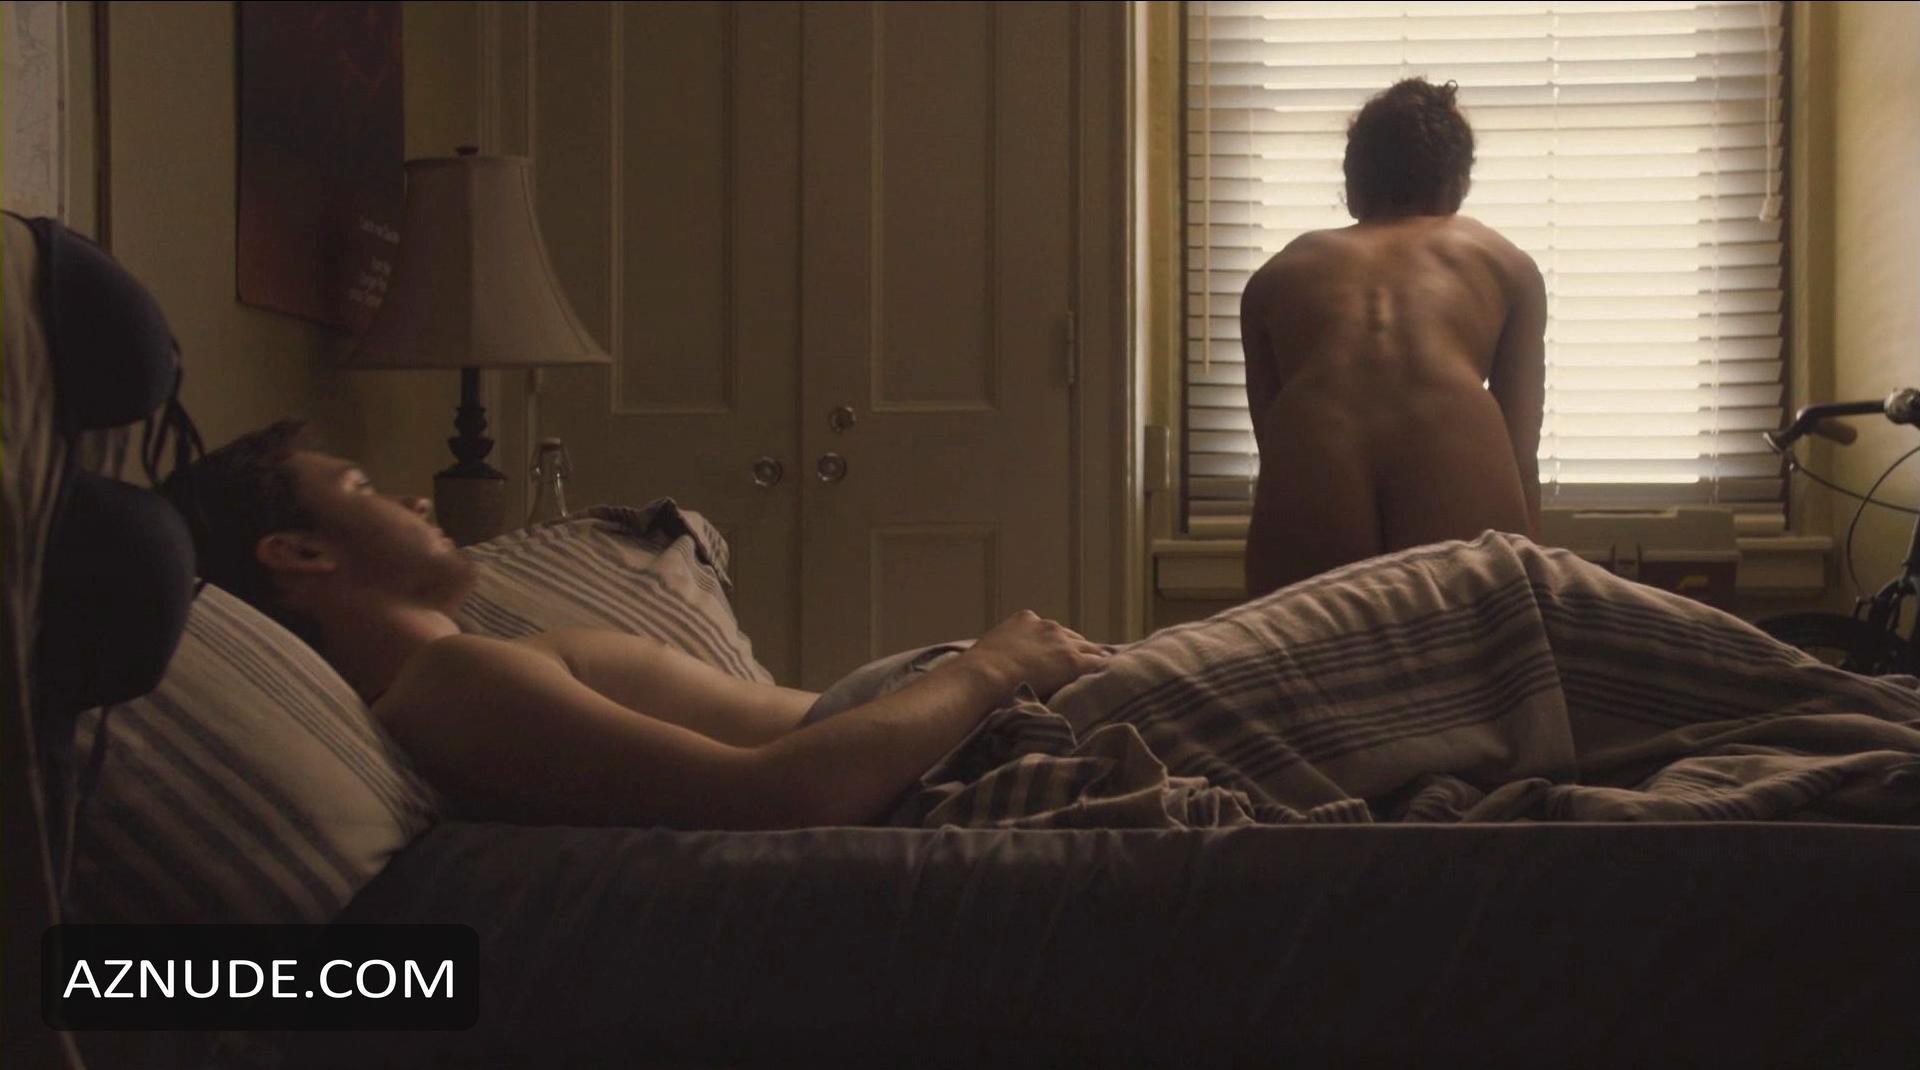 Thandie newton sex in the leading man scandalplanetcom - 2 part 4